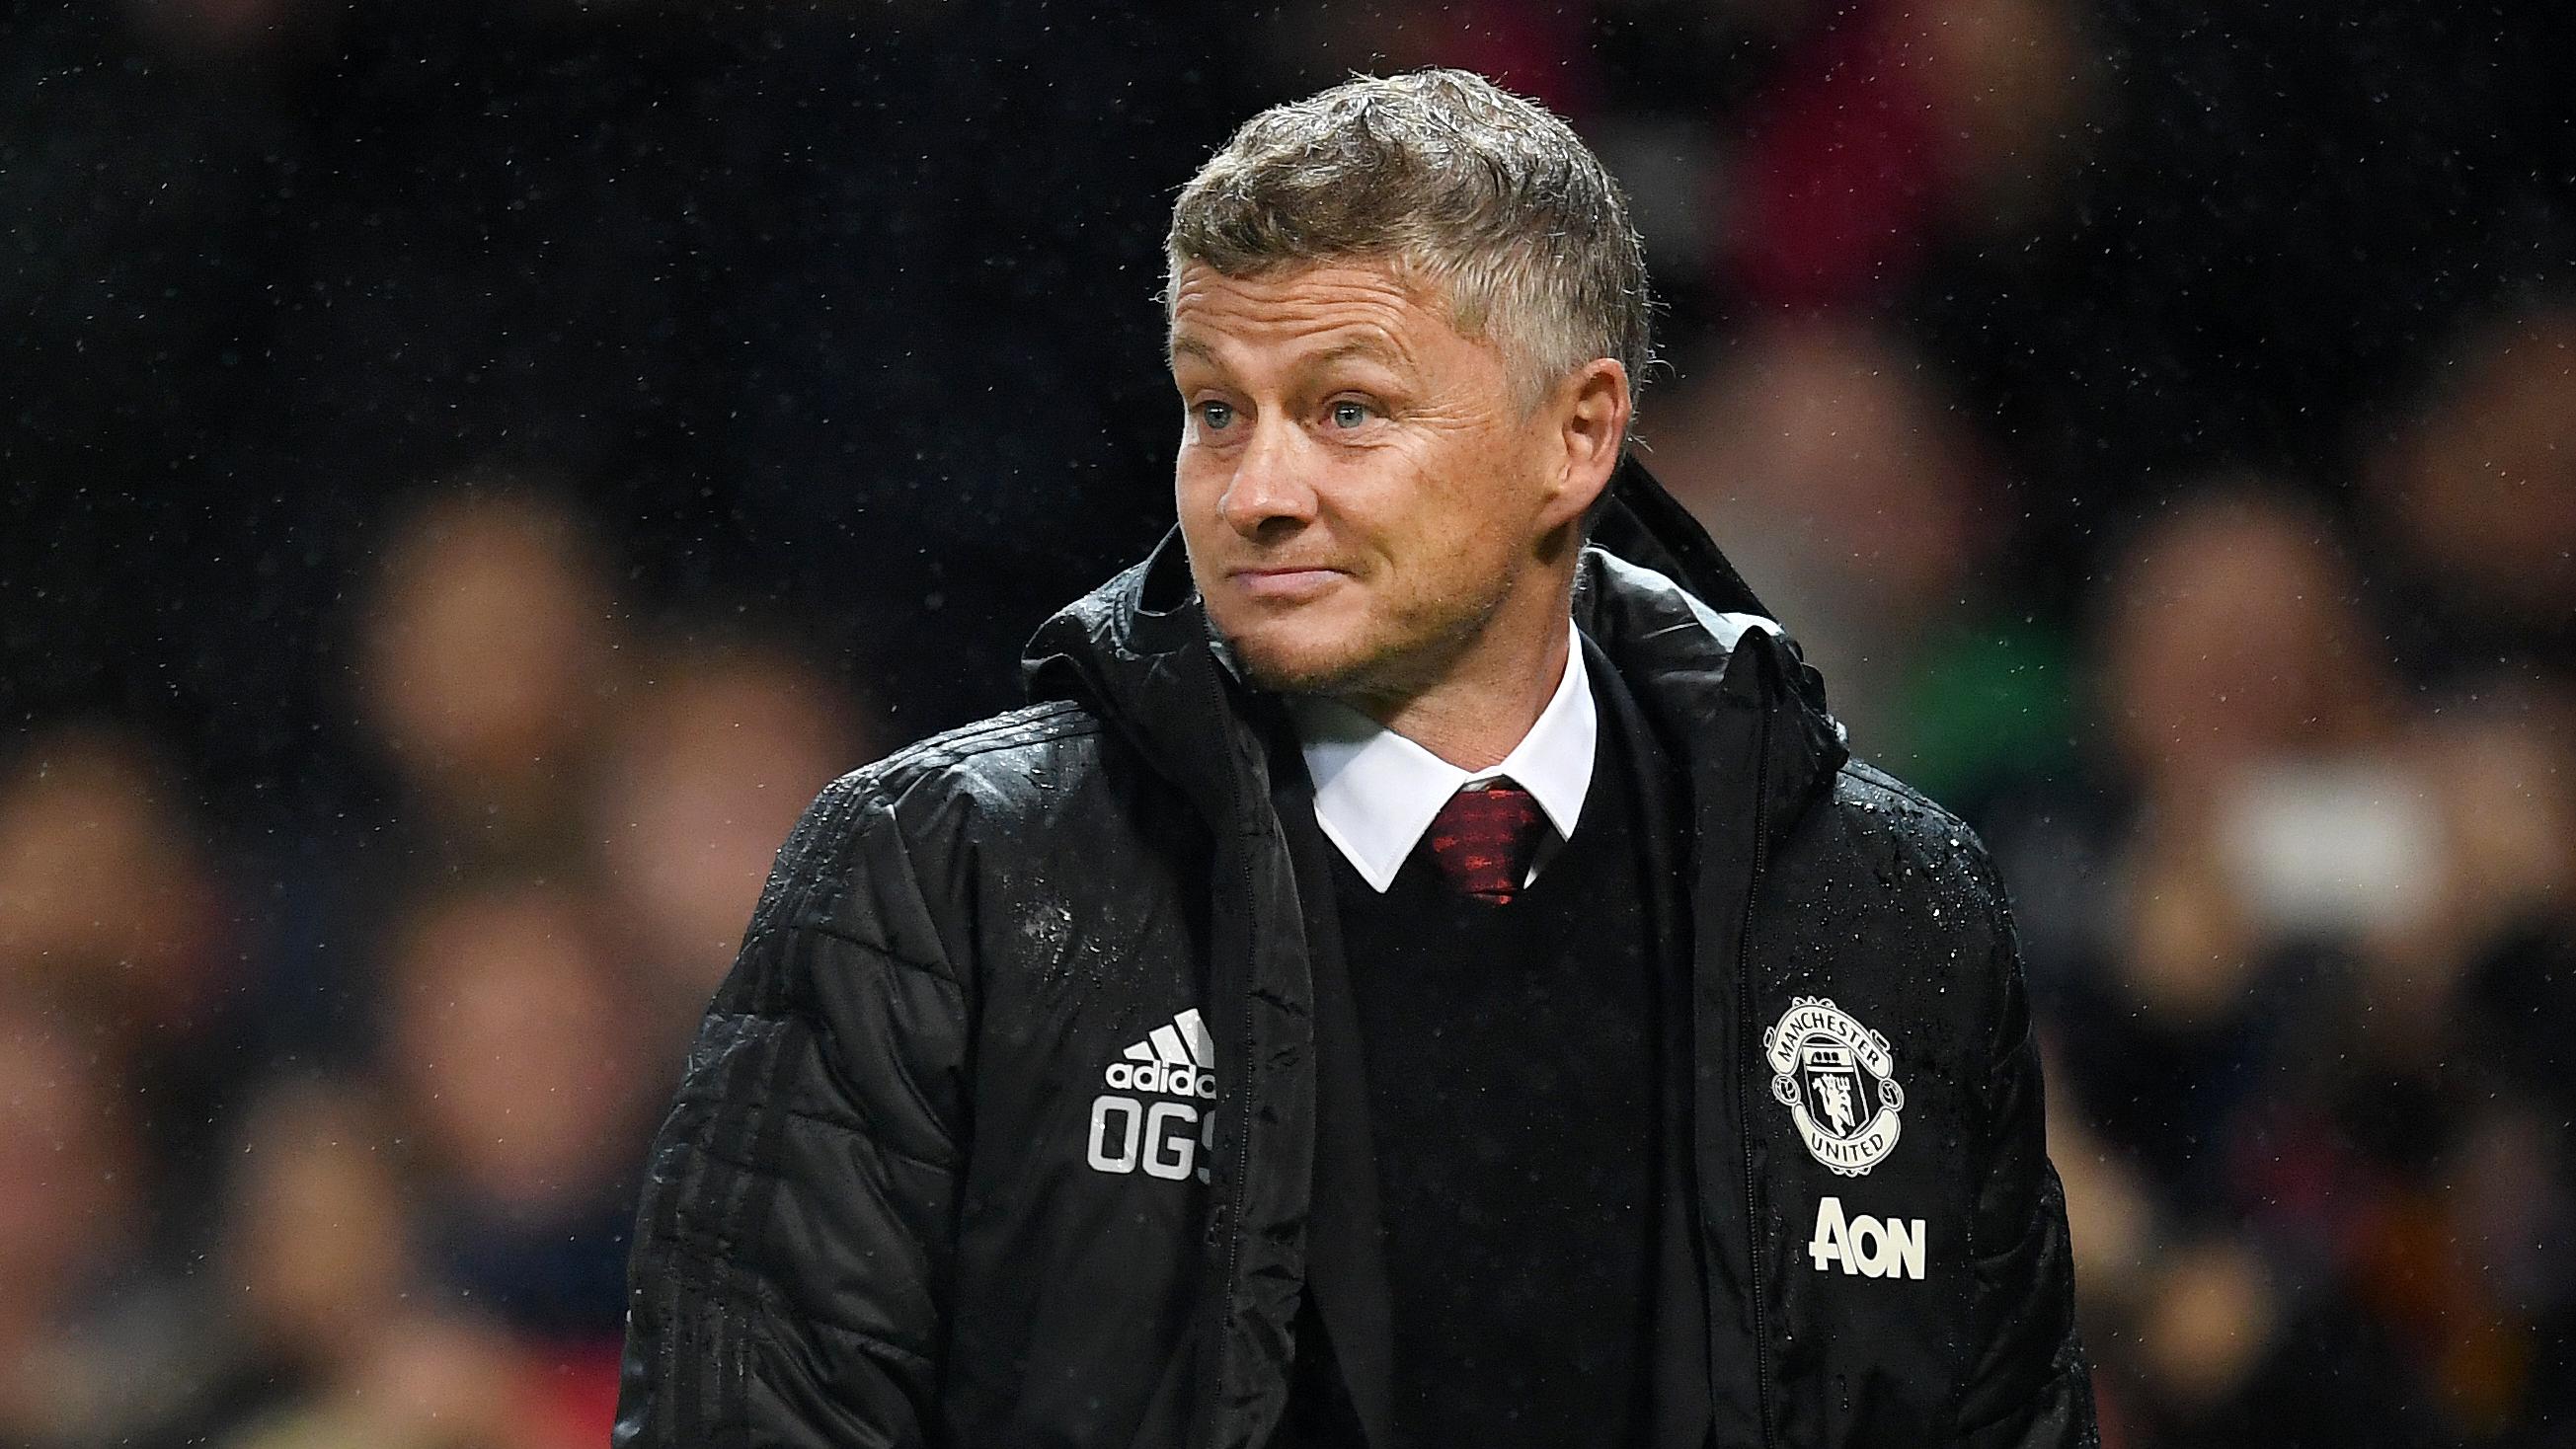 Ole Gunnar Solskjaer Manchester United 2019